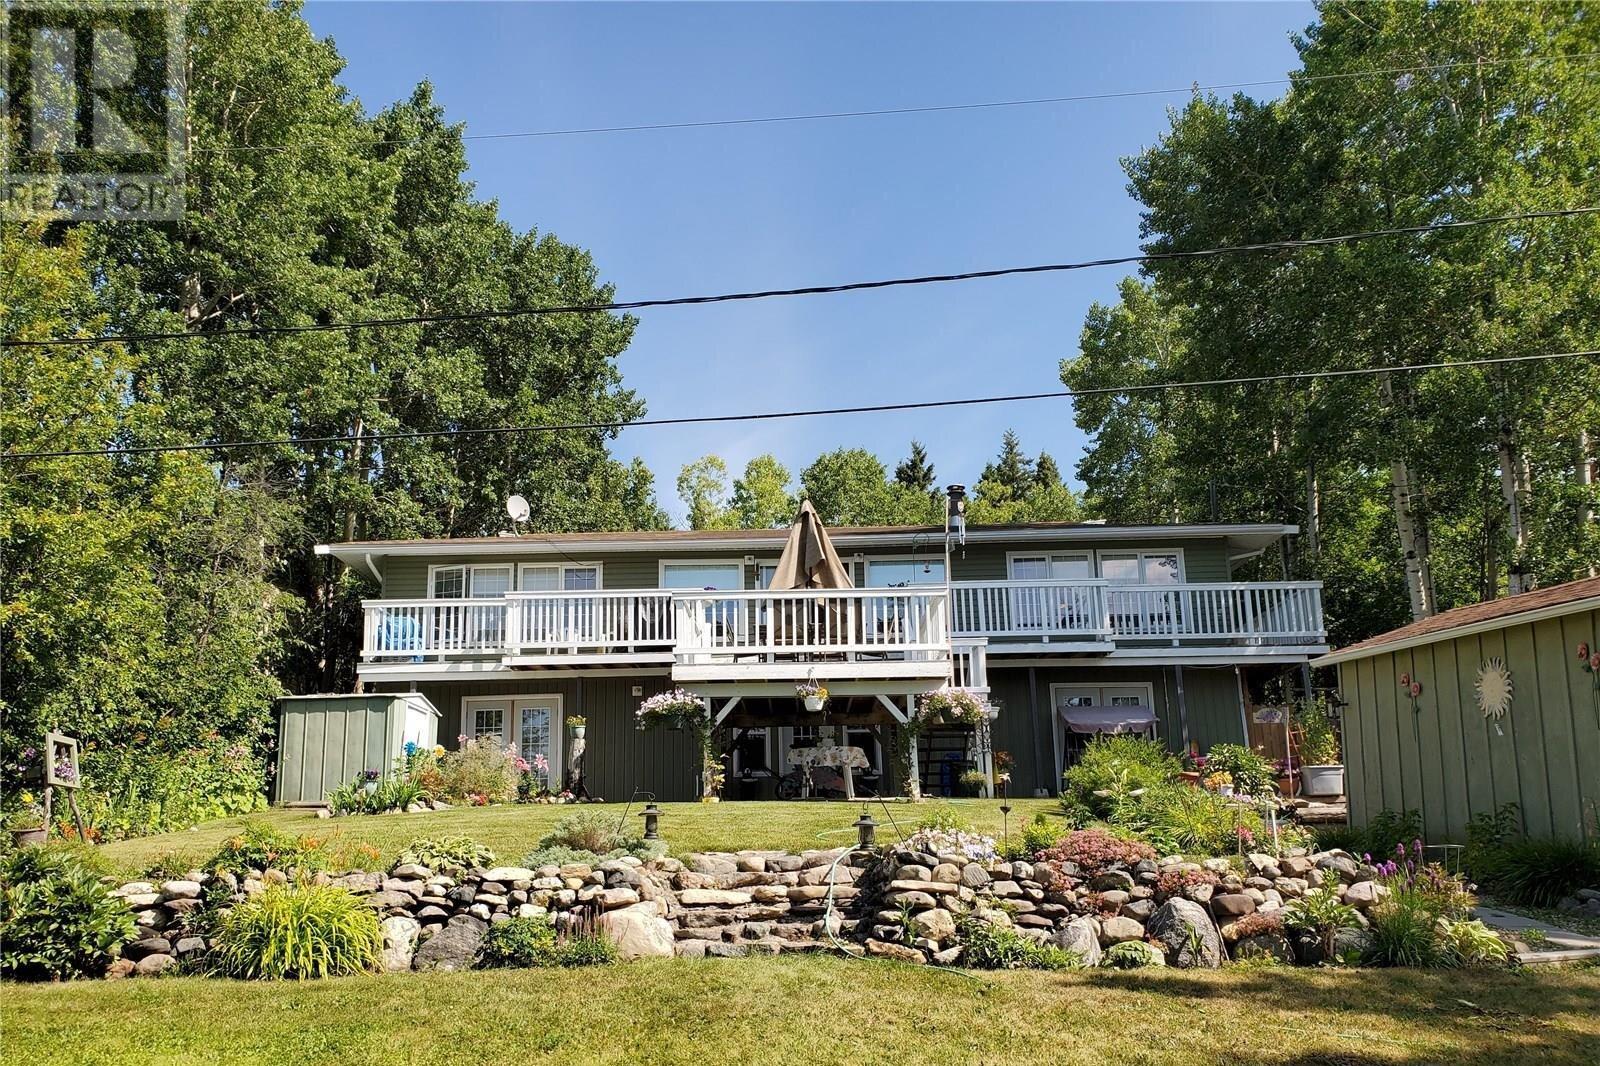 House for sale at 32 Oskunamoo Dr Greenwater Provincial Park Saskatchewan - MLS: SK818129